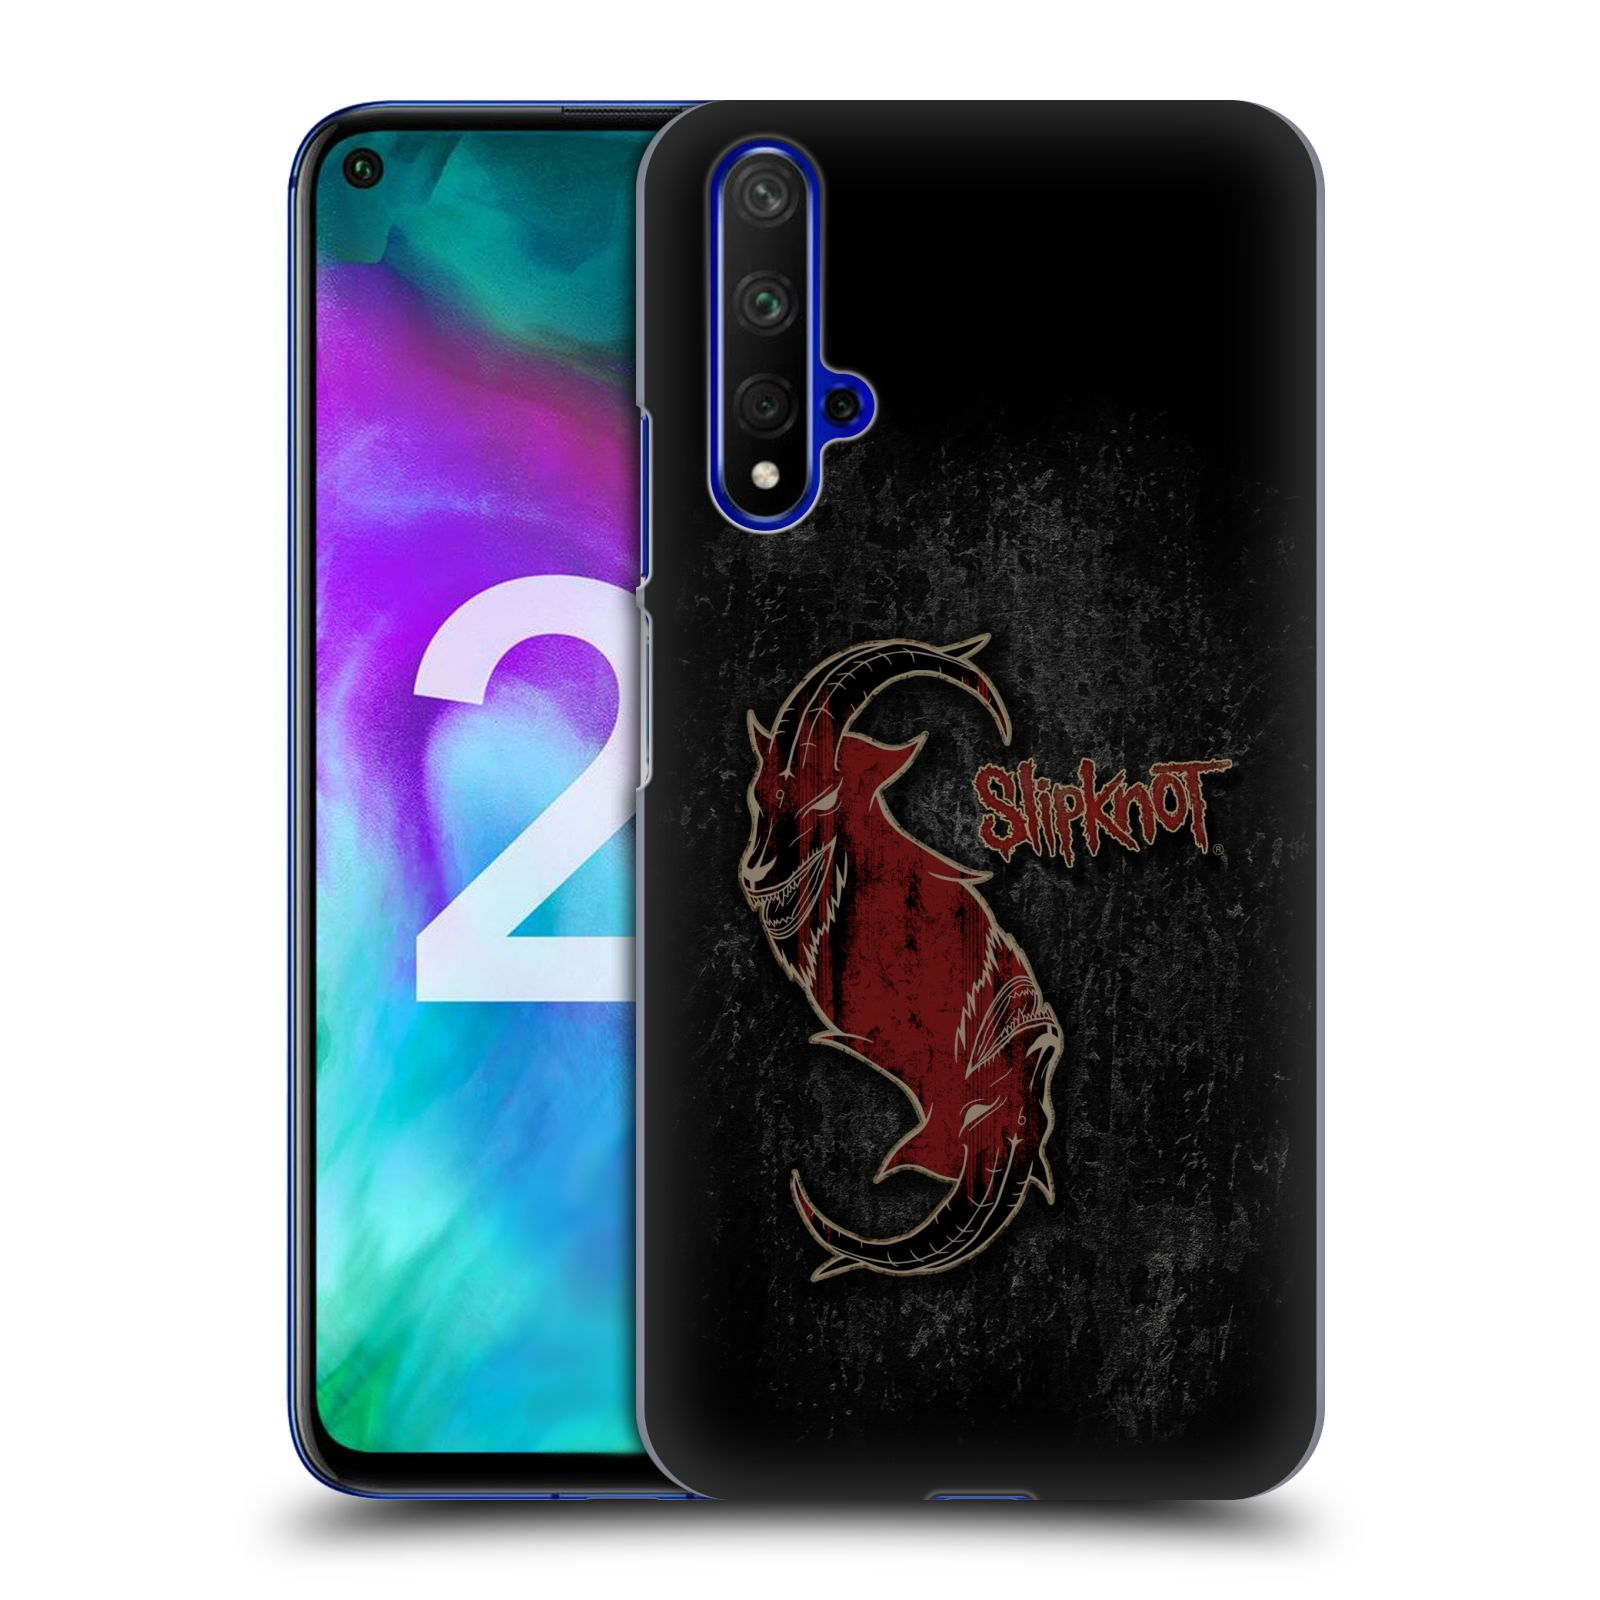 Plastové pouzdro na mobil Honor 20 - Head Case - Slipknot - Rudý kozel